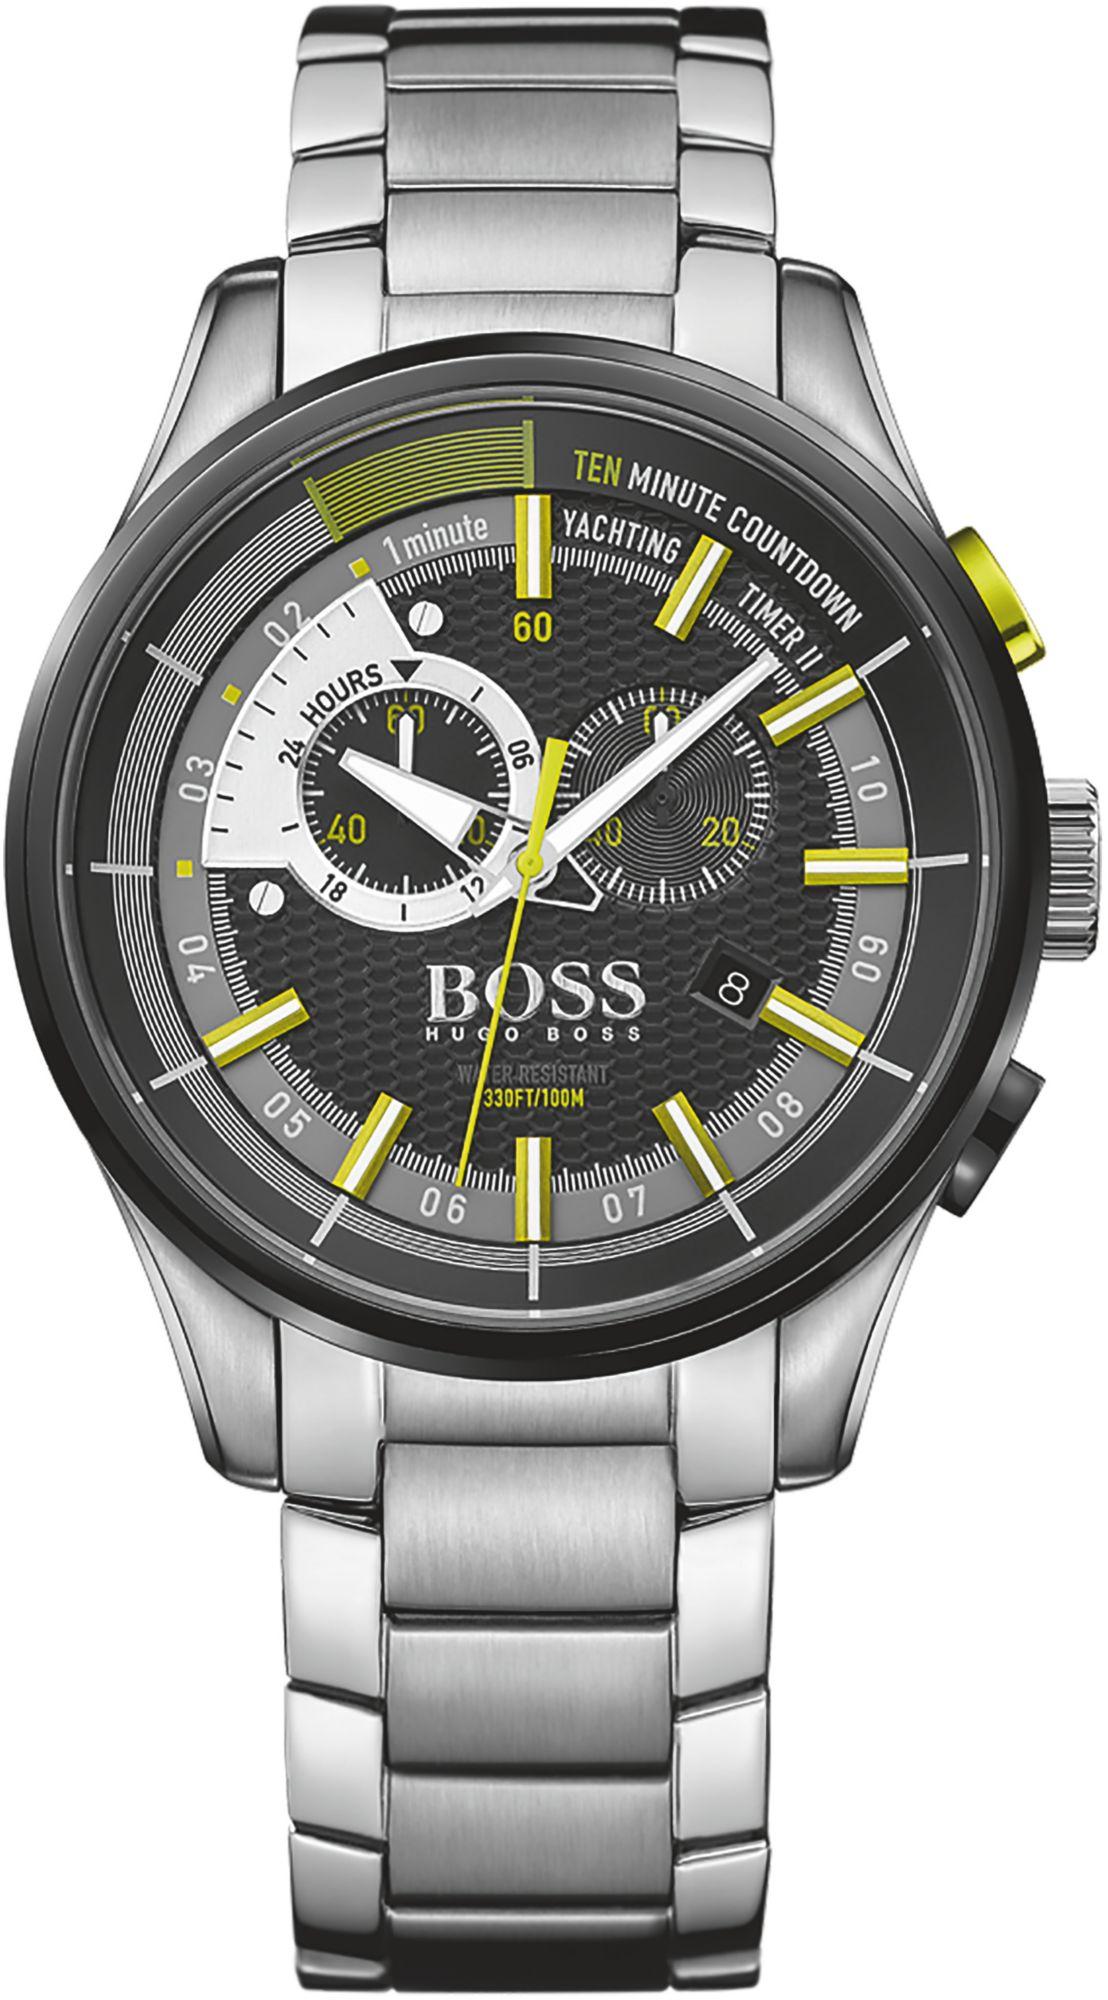 BOSS Boss Chronograph »YACHTING TIMER II, 1513336«